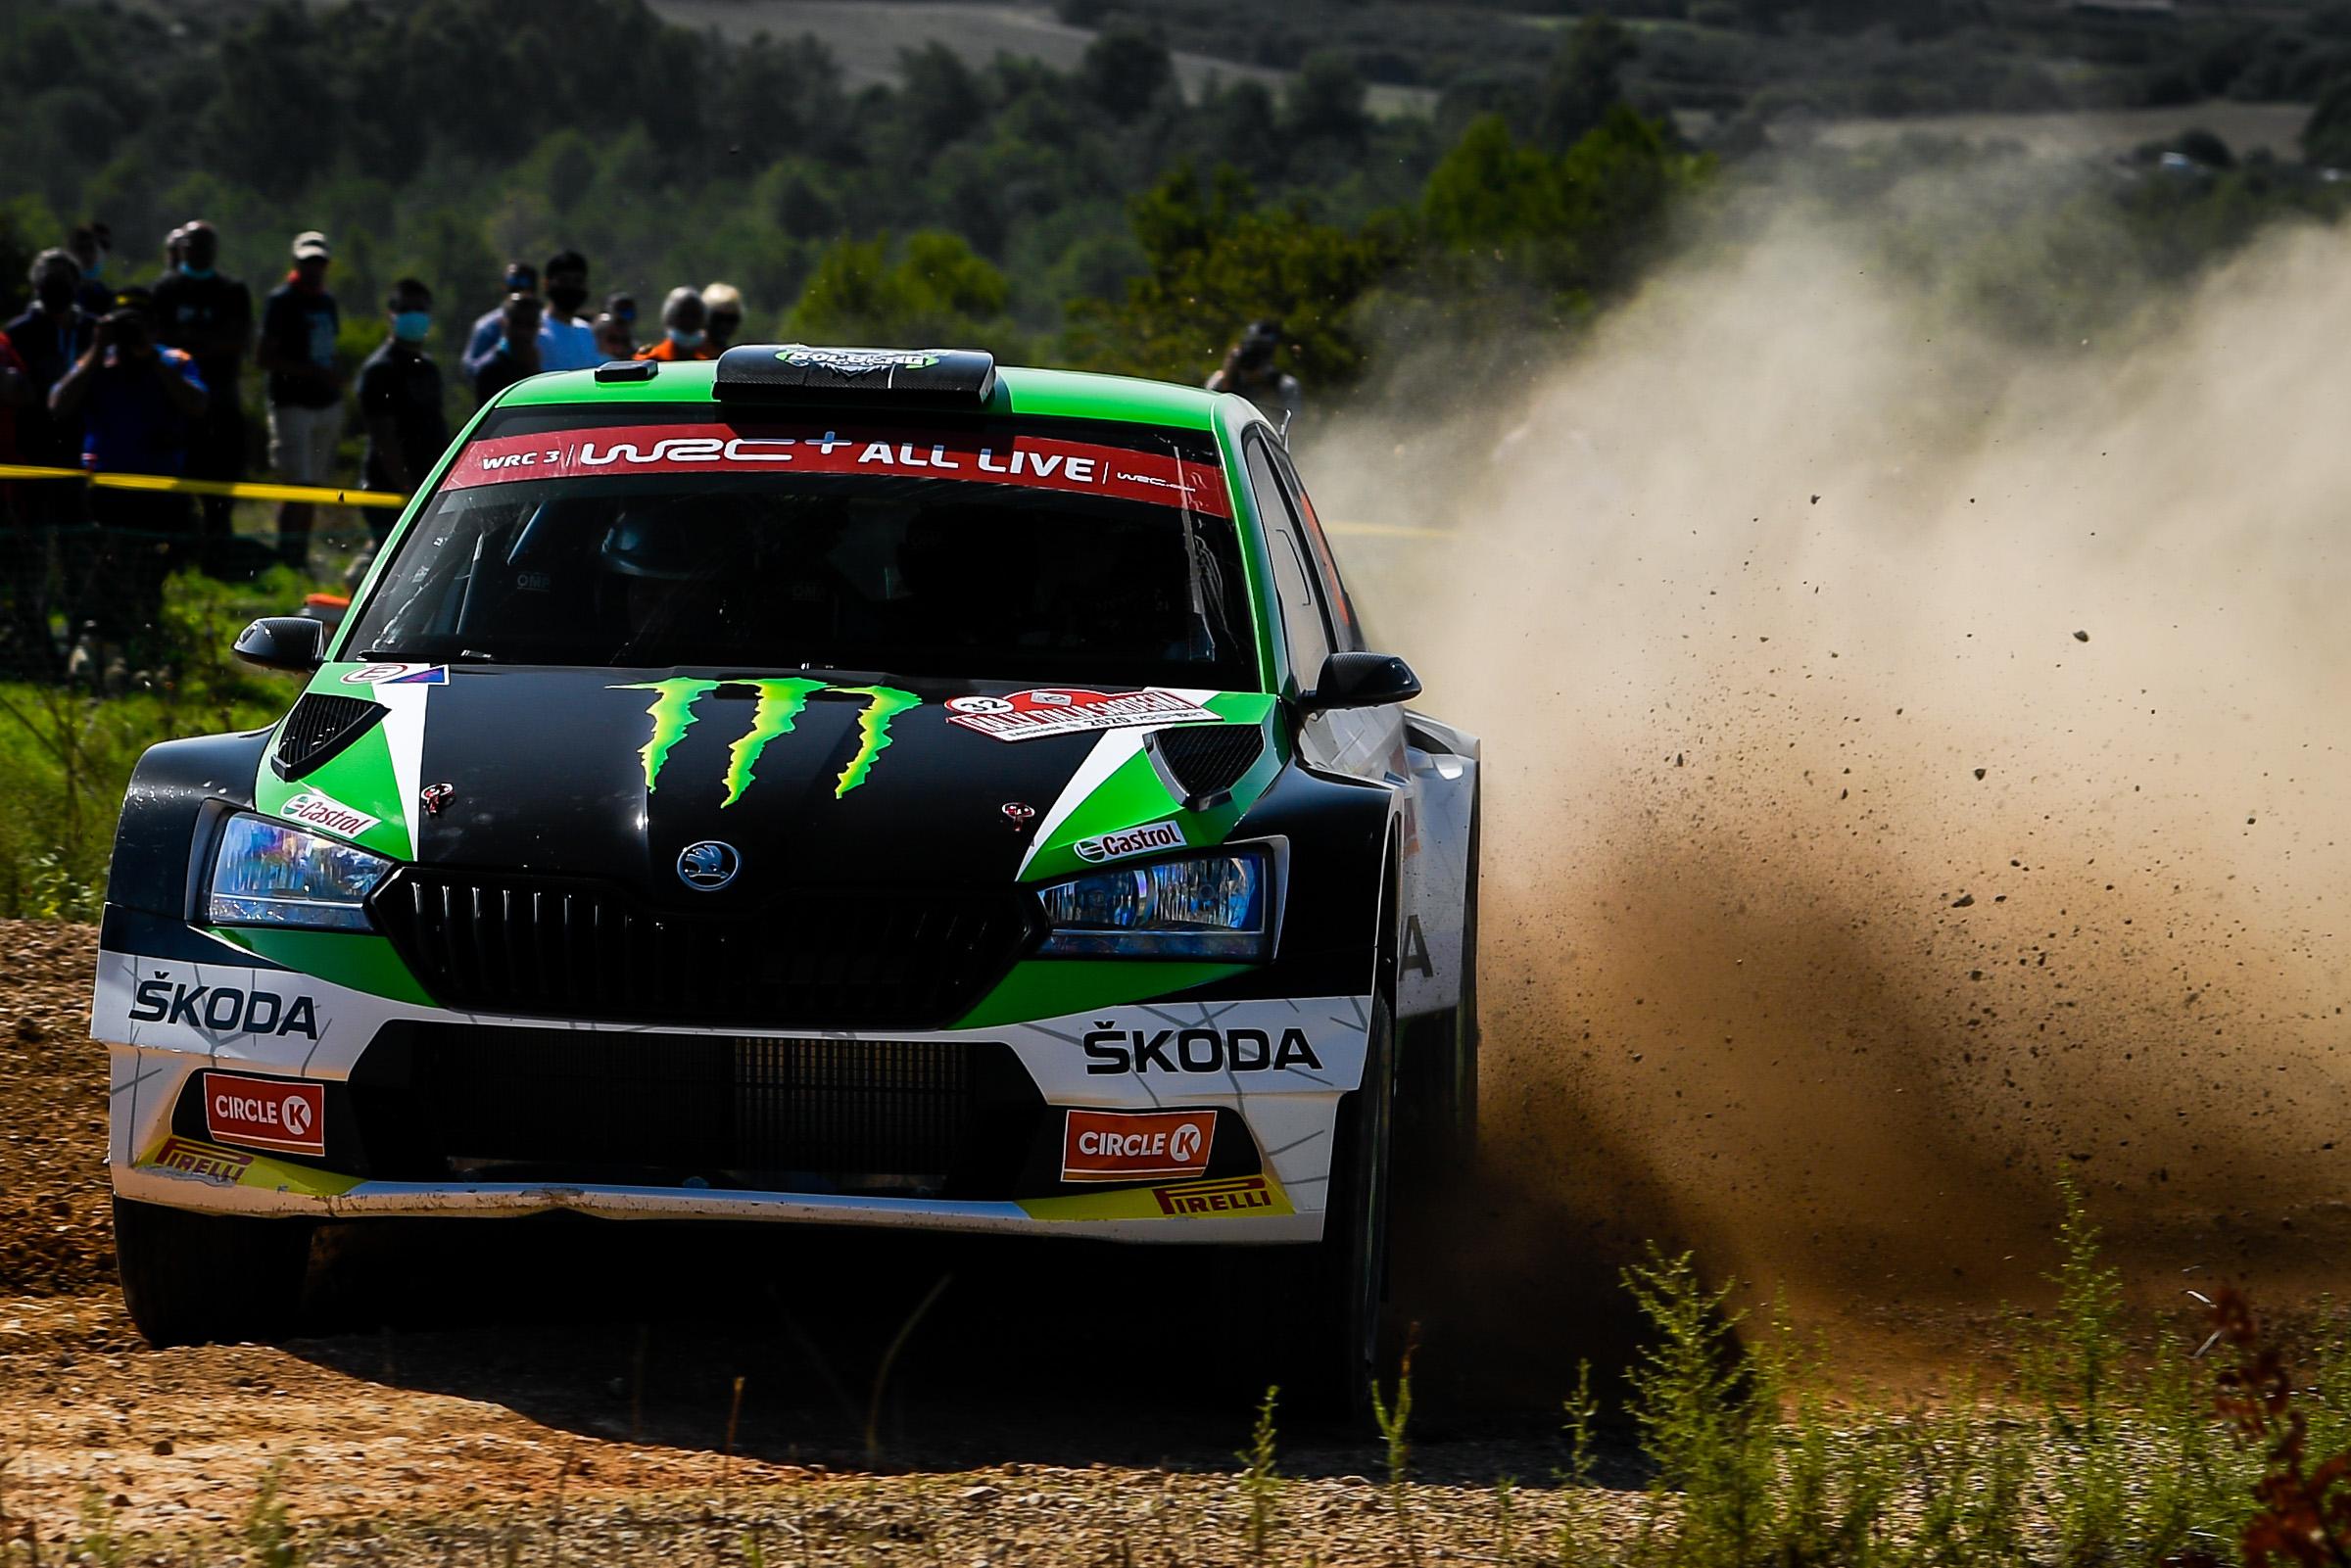 WRC: Rally d' Italia - Sardegna [8-10 Octubre] - Página 2 Ejz8r5KVoAQm4iF?format=jpg&name=4096x4096